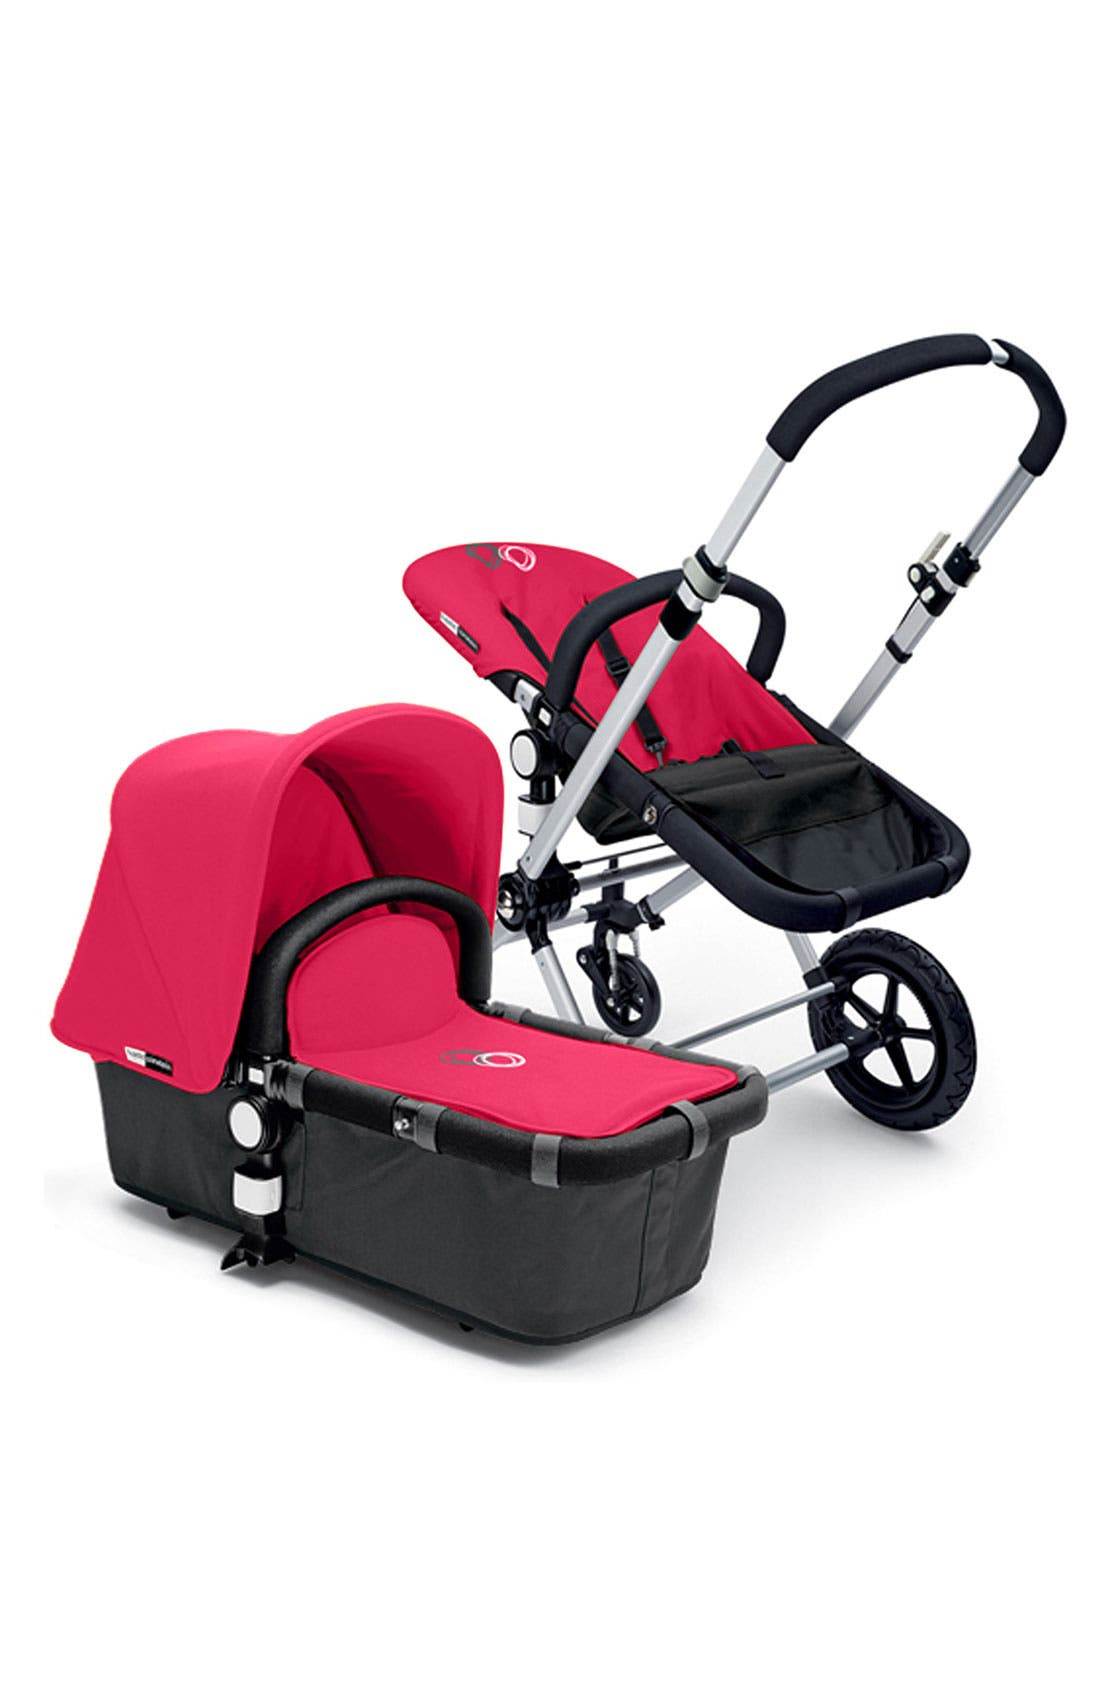 Main Image - Bugaboo 'Cameleon' Tailored Canvas Stroller Set